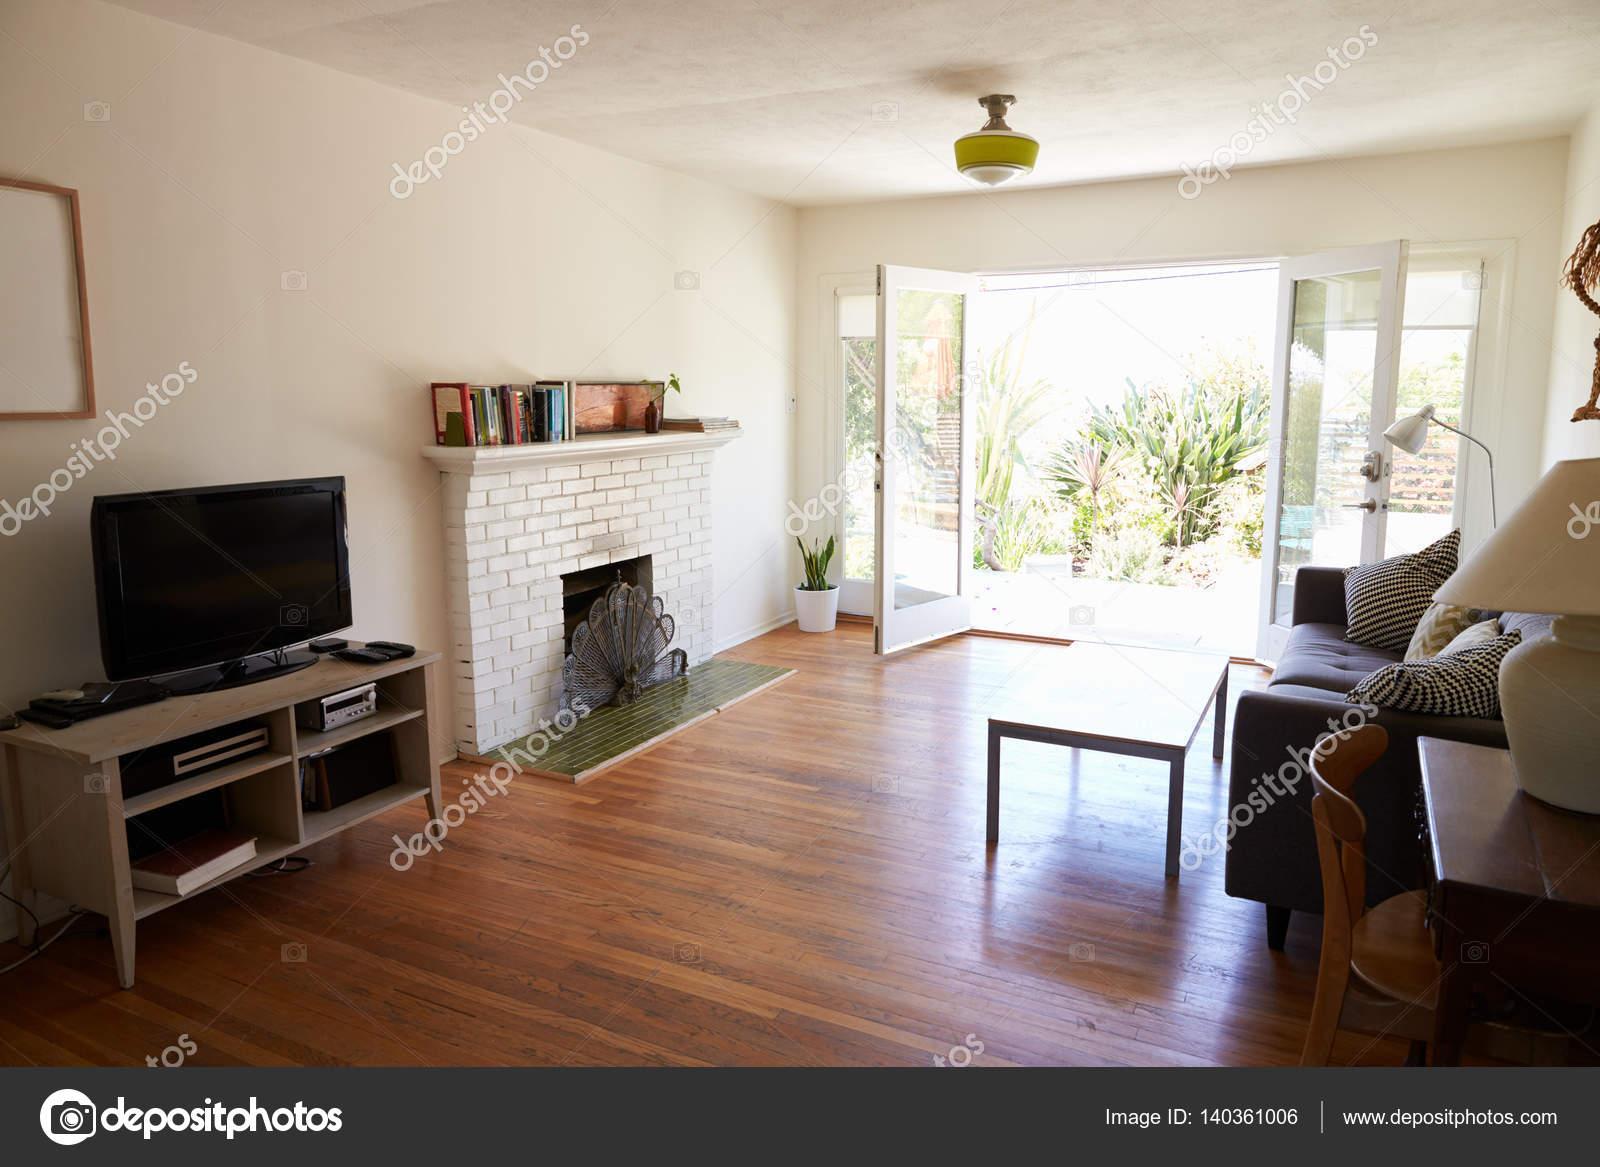 Interieur van moderne lounge u2014 stockfoto © monkeybusiness #140361006